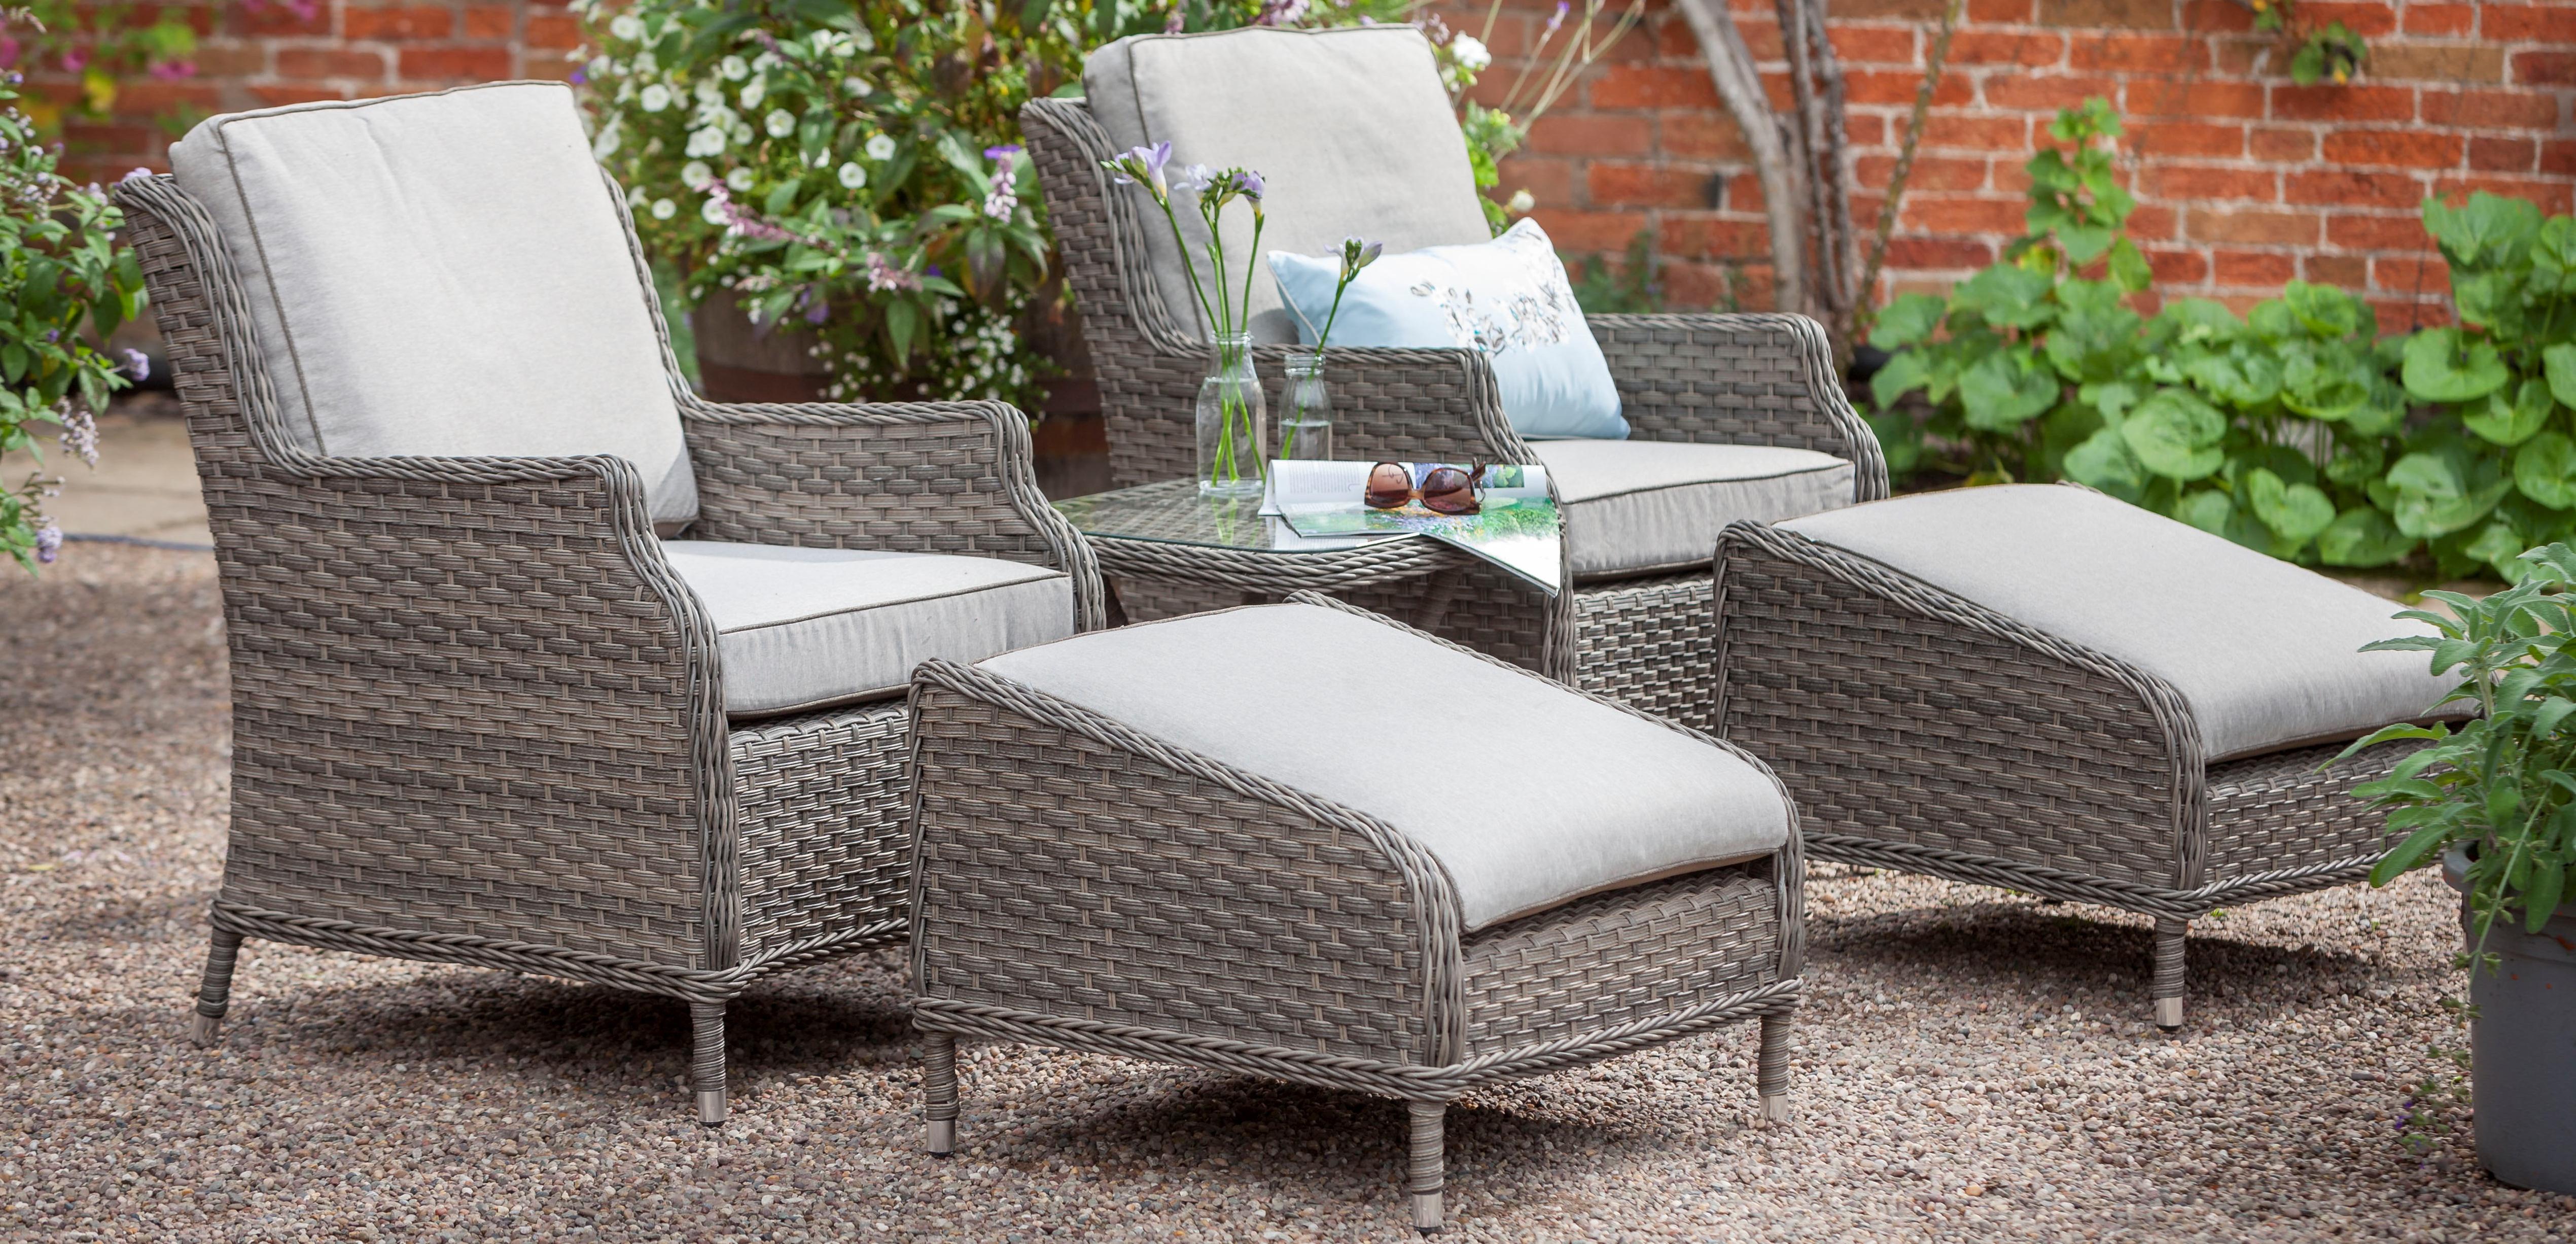 1979c482927 ... Henley Iron Grey Garden Furniture From John Lewis Kettler. Garden  Furniture S1du Garden Furniture Outdoor Garden  Garden Furniture Wddj top  10 New ...